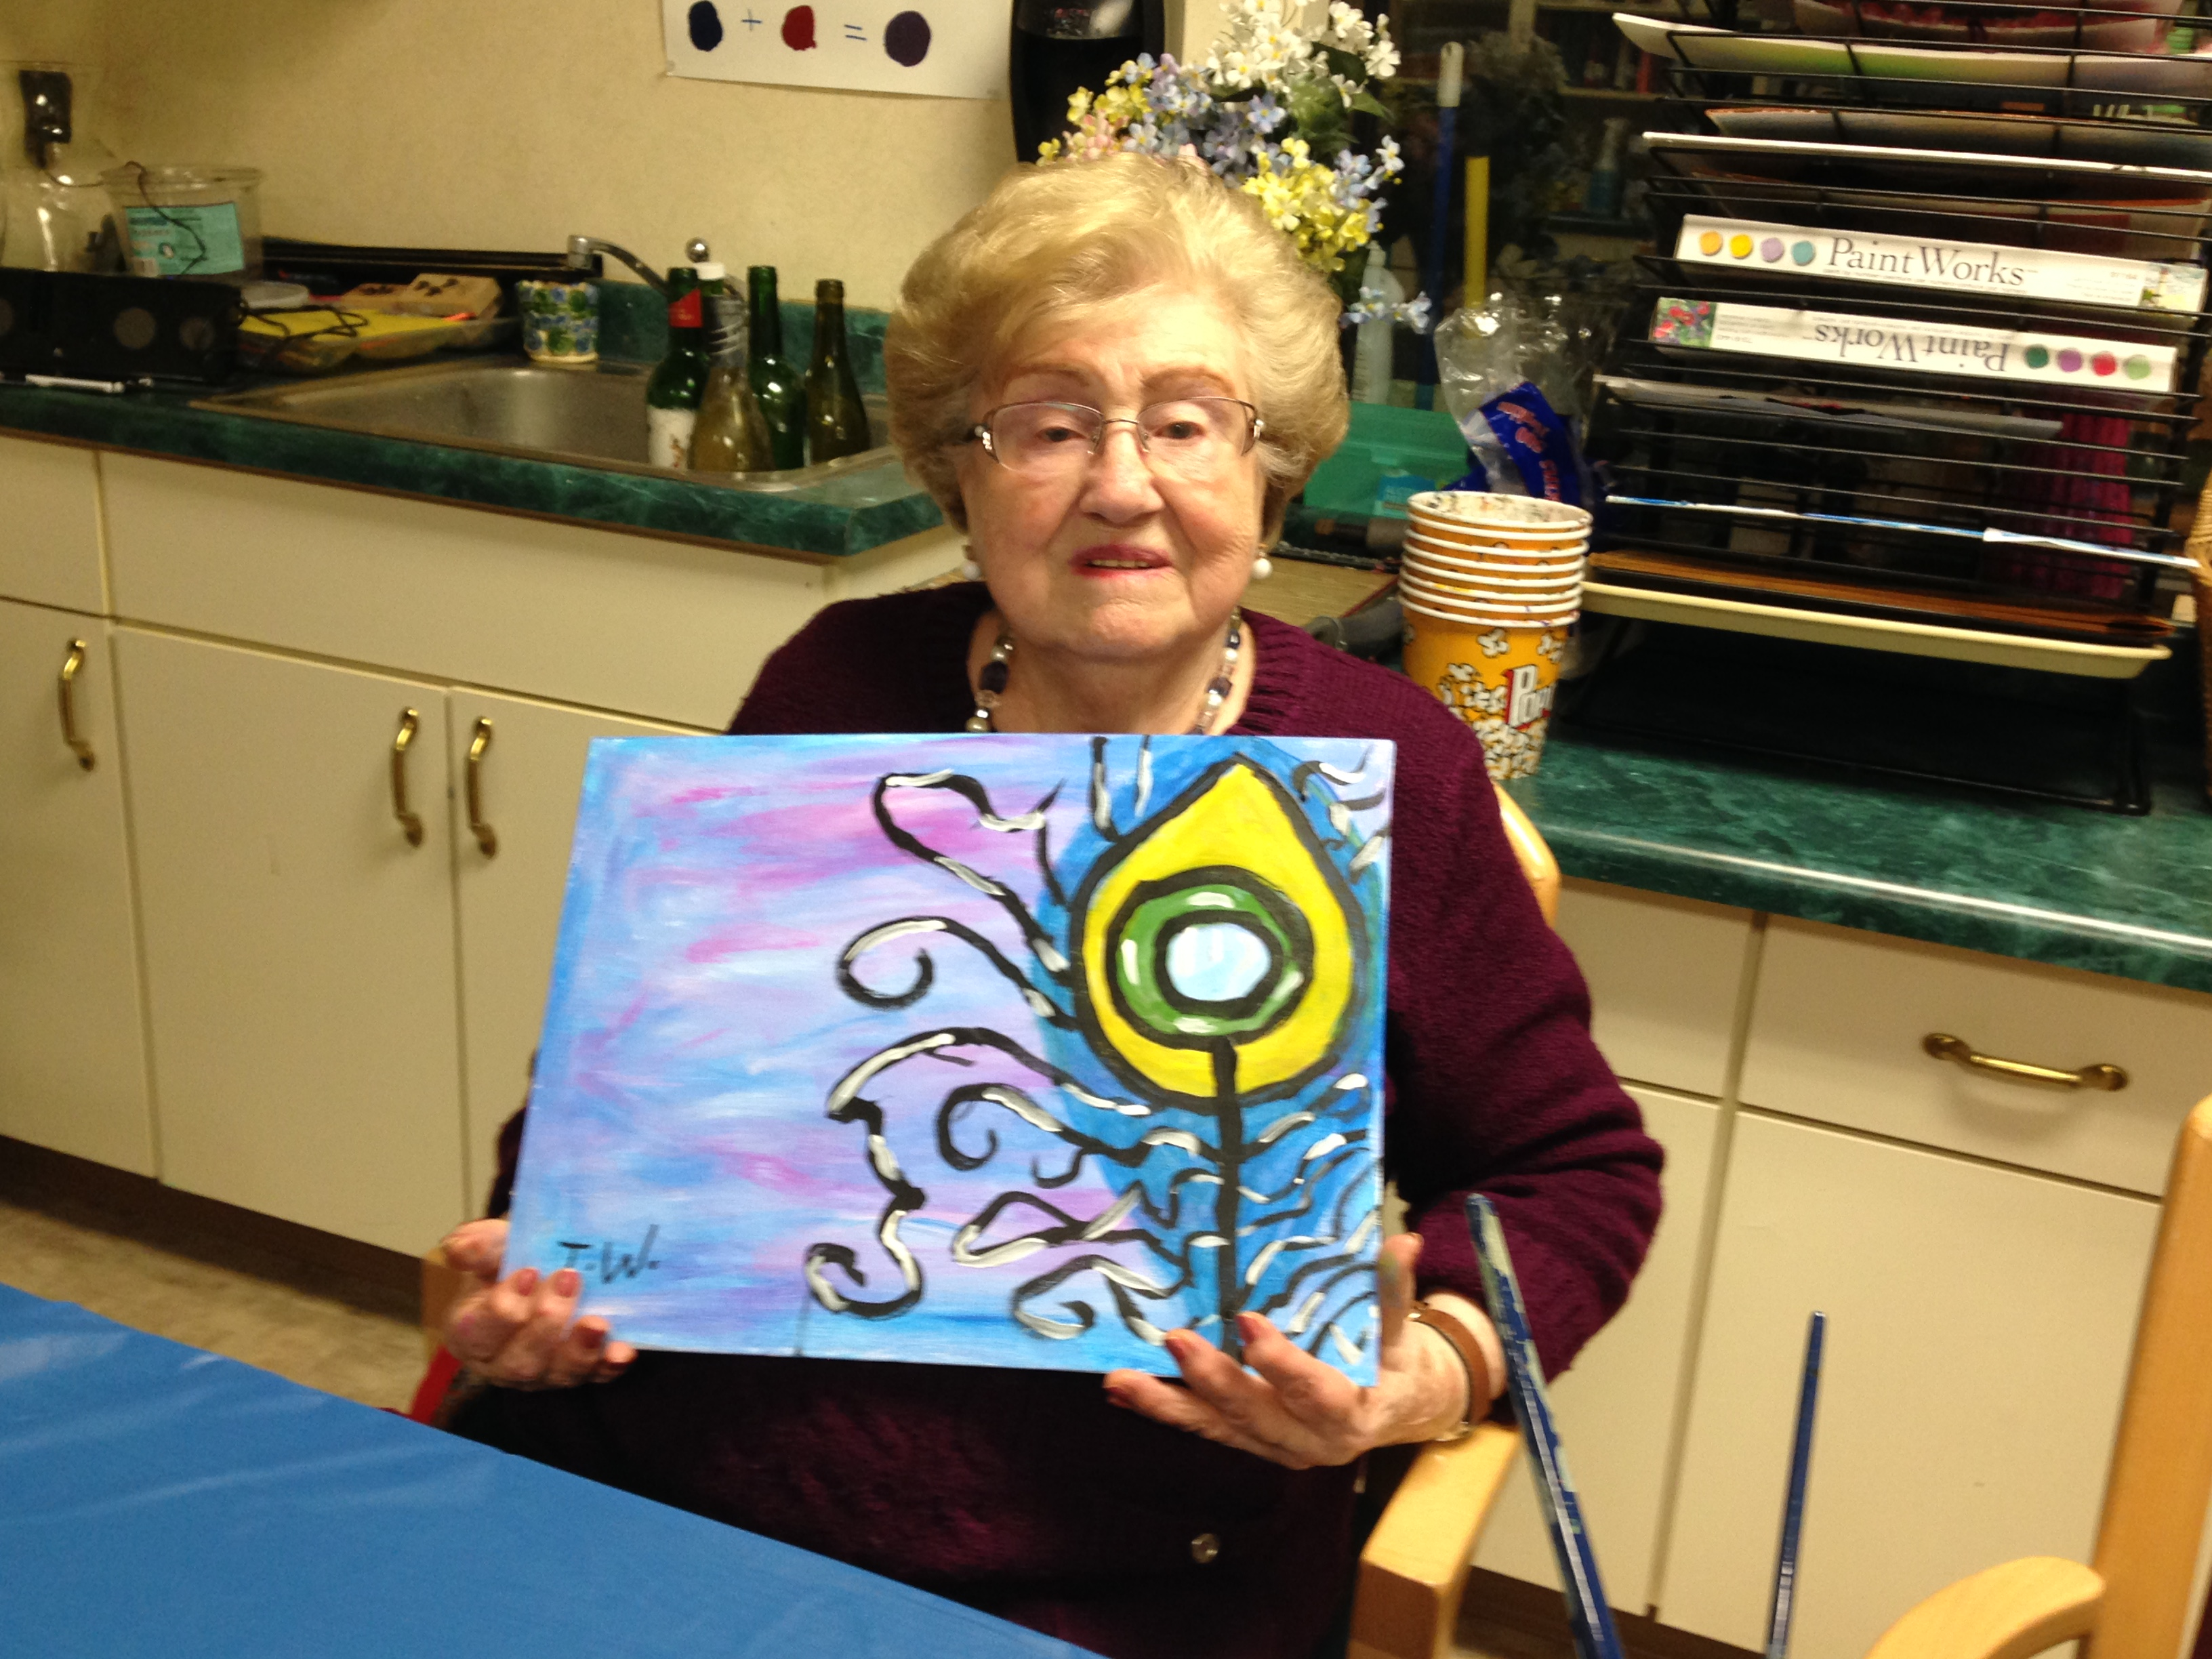 RHMA painting event 2/3/16